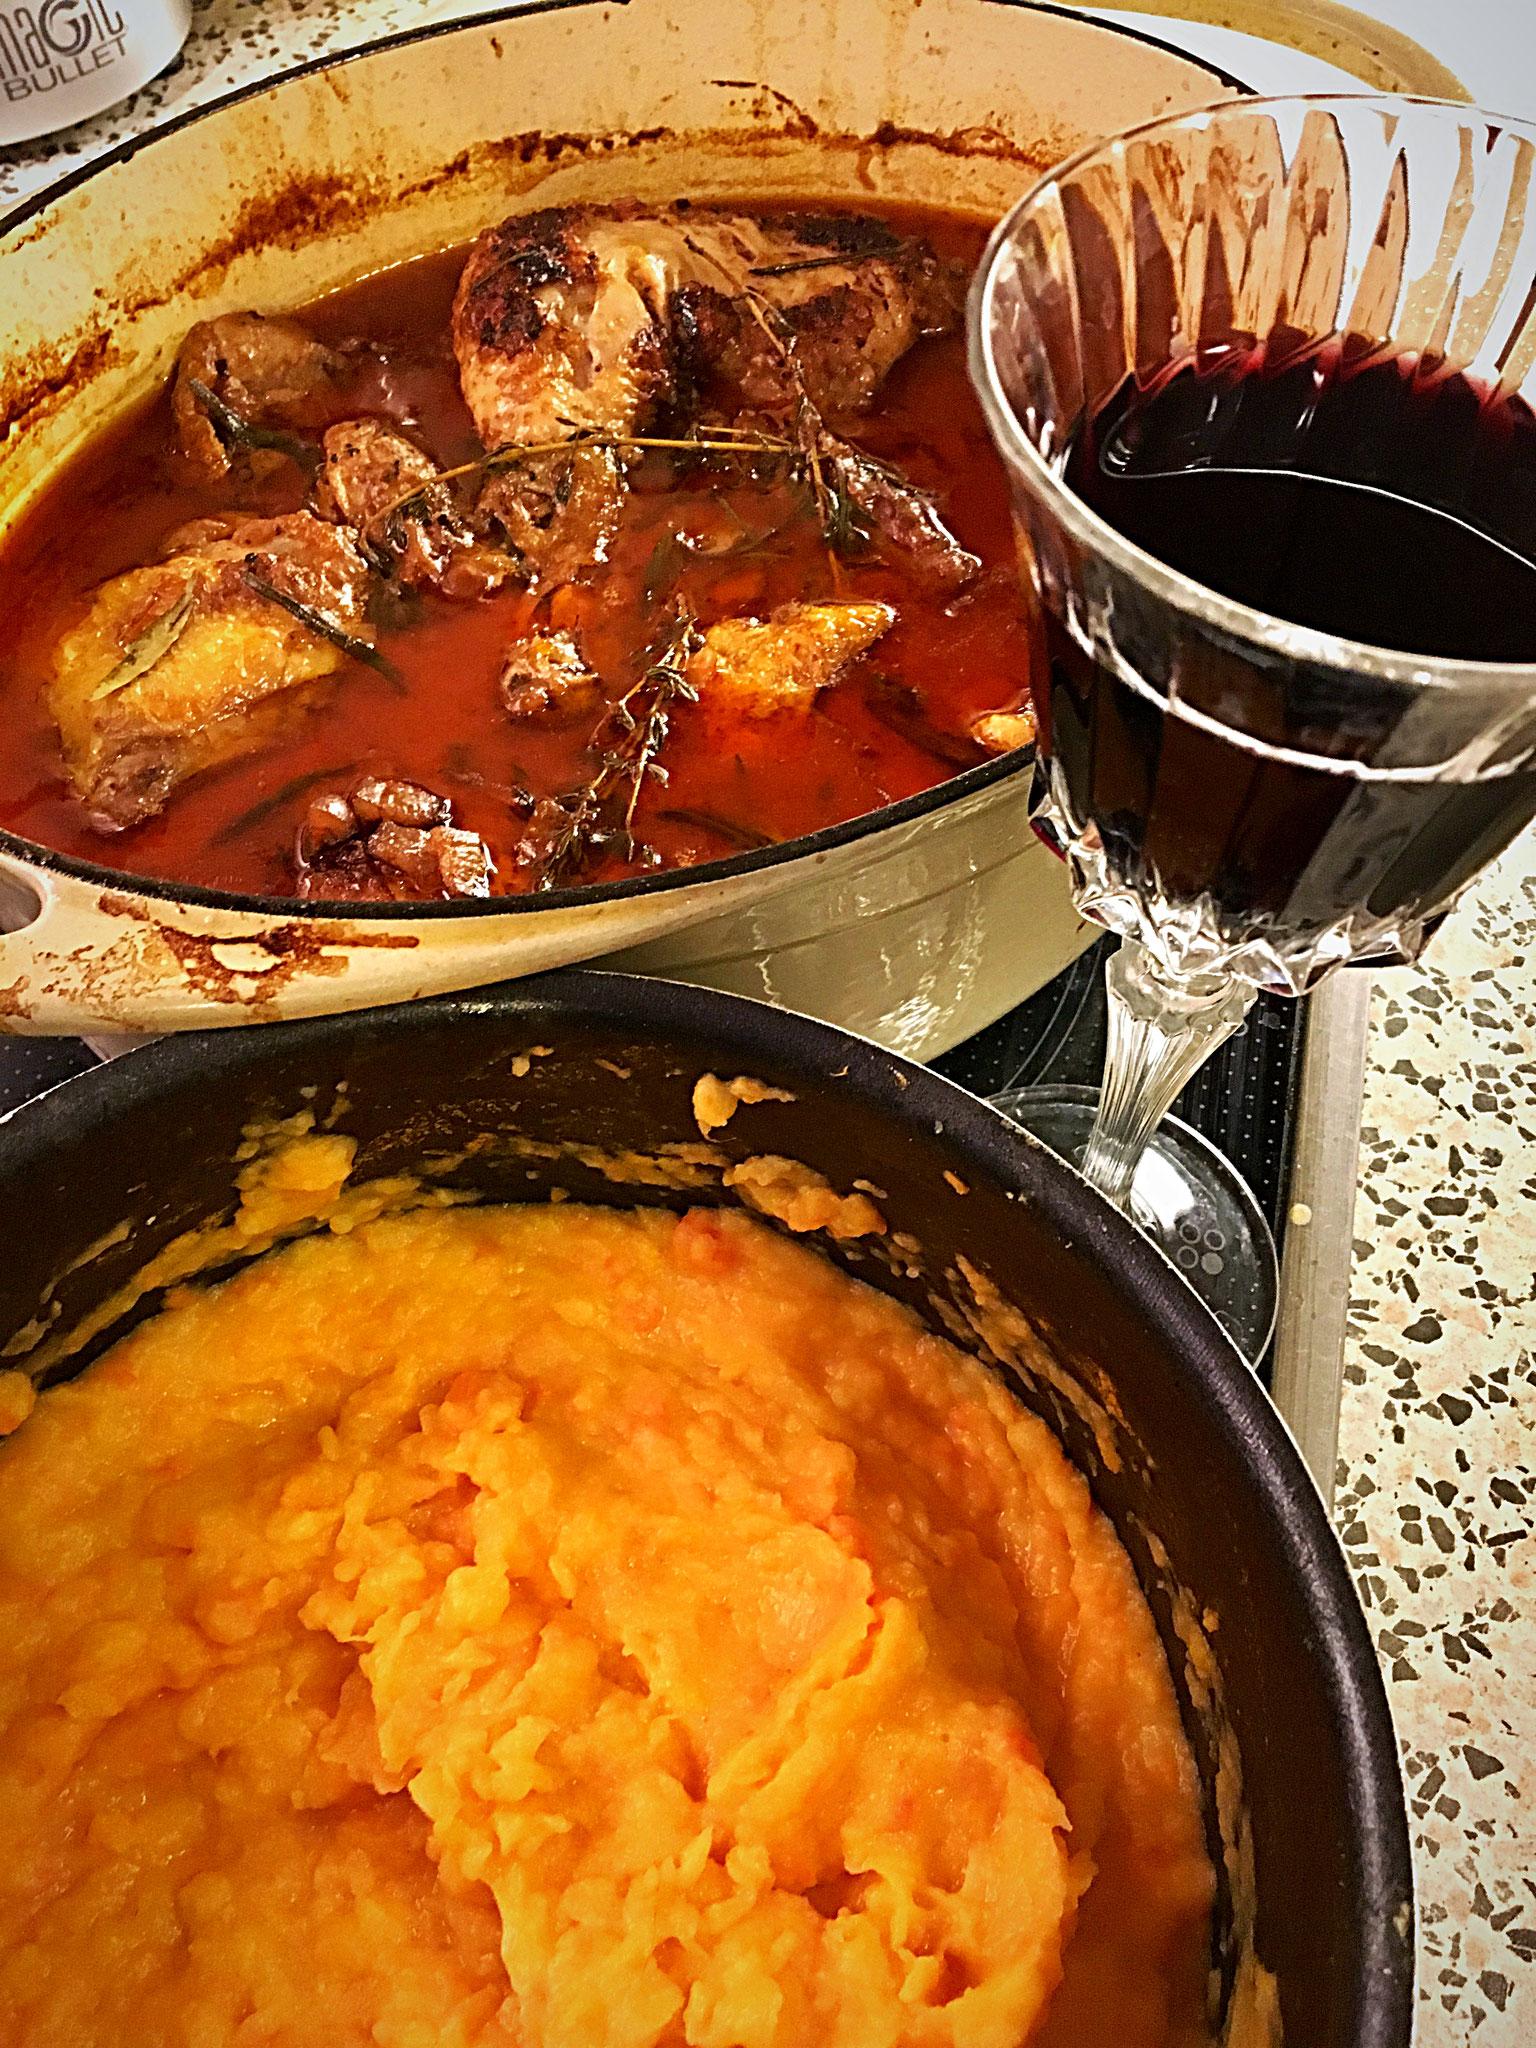 Coque au Vin with Sweet Potato Mash